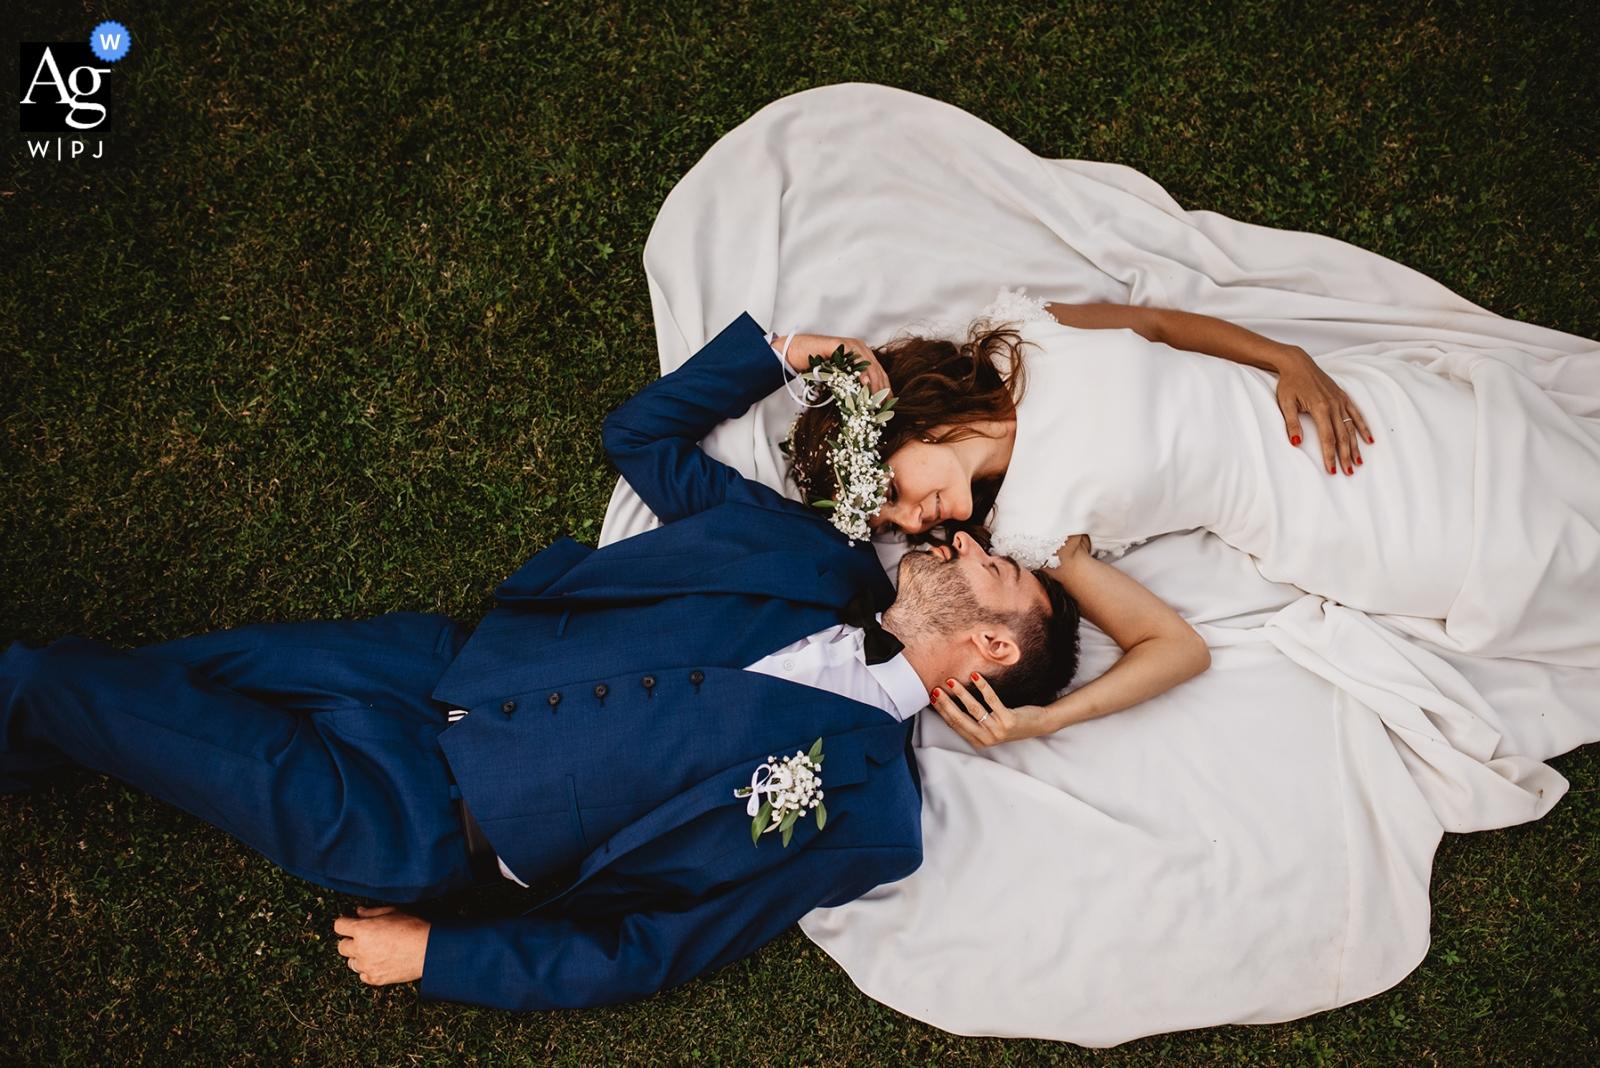 Badia à Coltibuono, Toscane | Photographe de mariage pour la Toscane